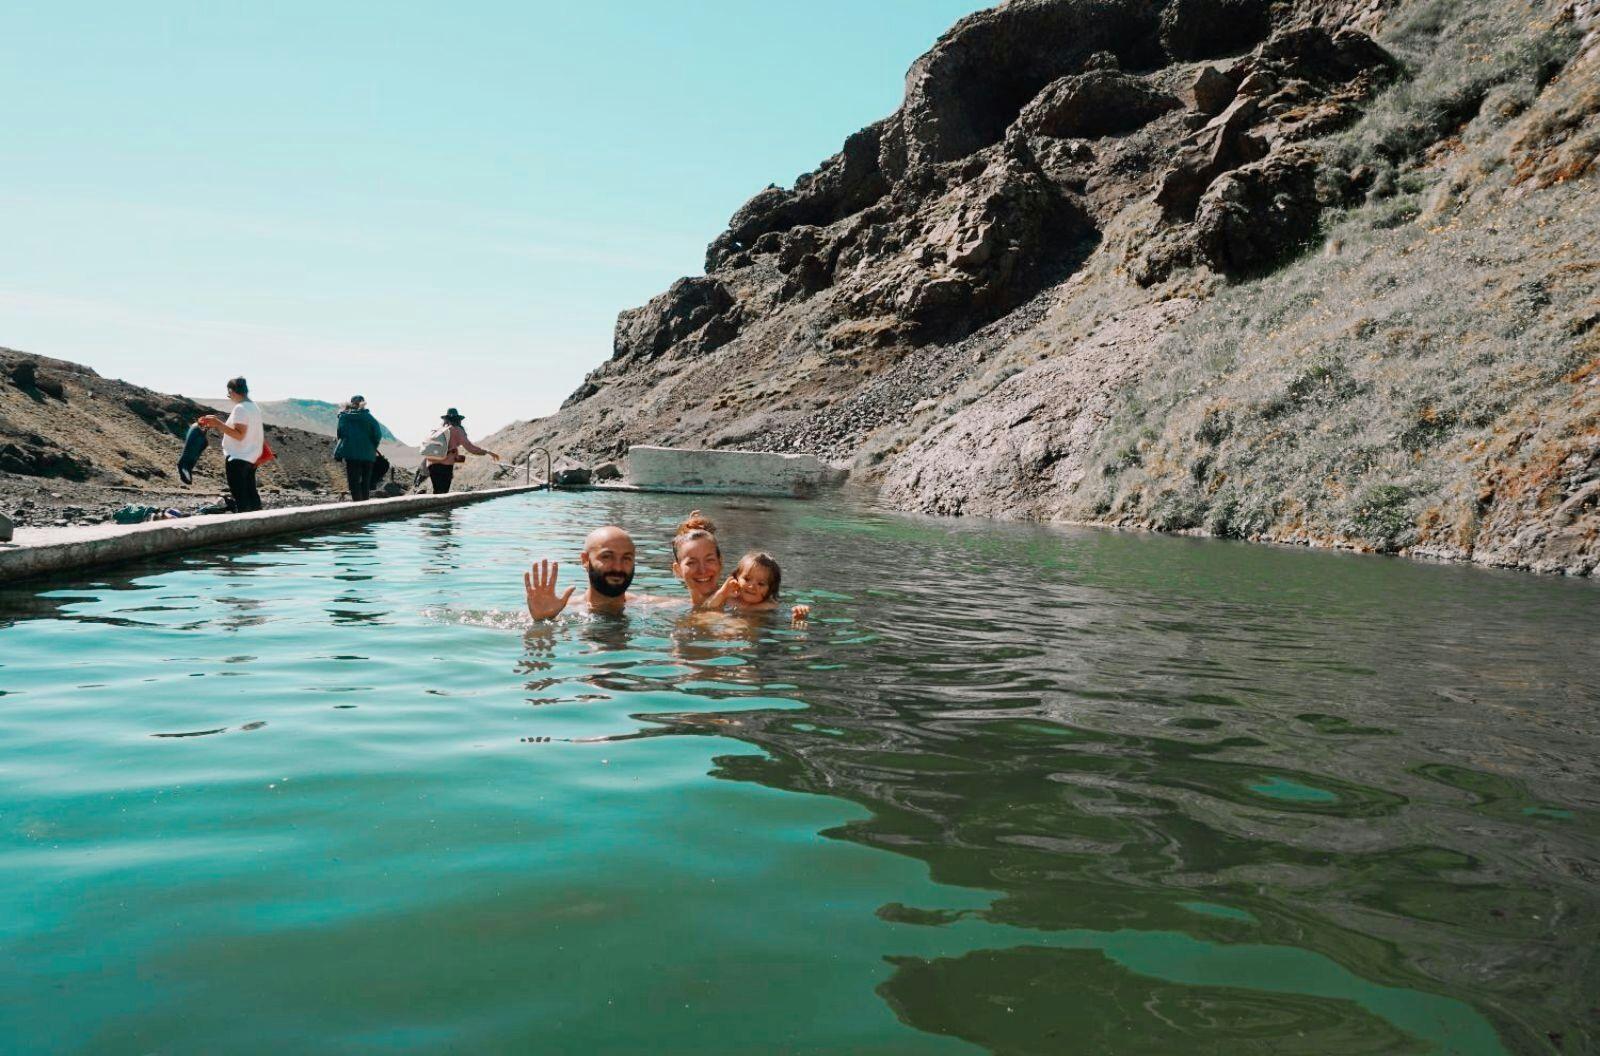 най-старият басейн в Исландия Seljavallalaug